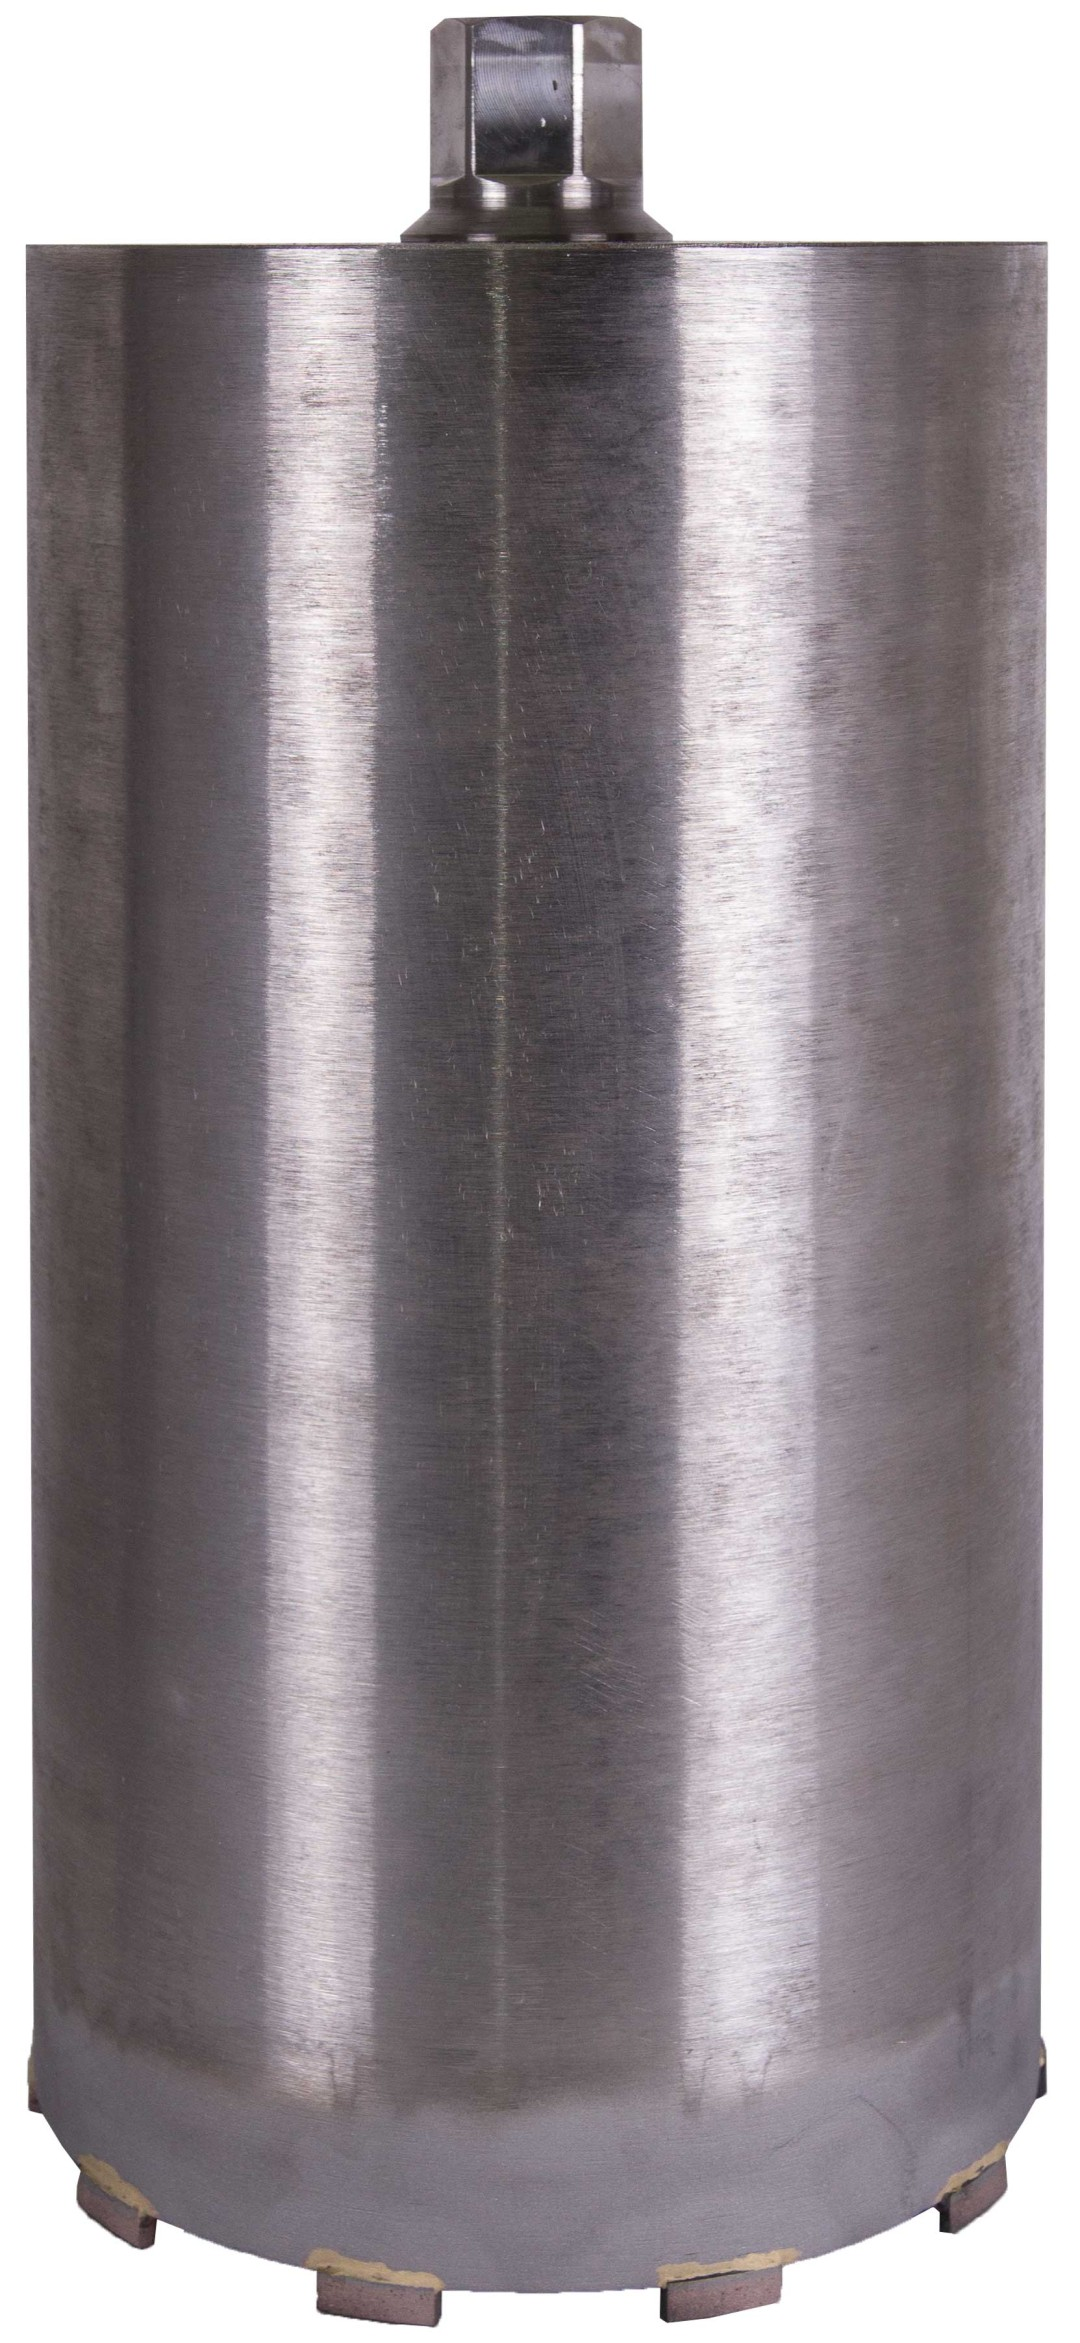 diamant-trockenbohrkrone-1-1-4-zoll-bktp-bkts